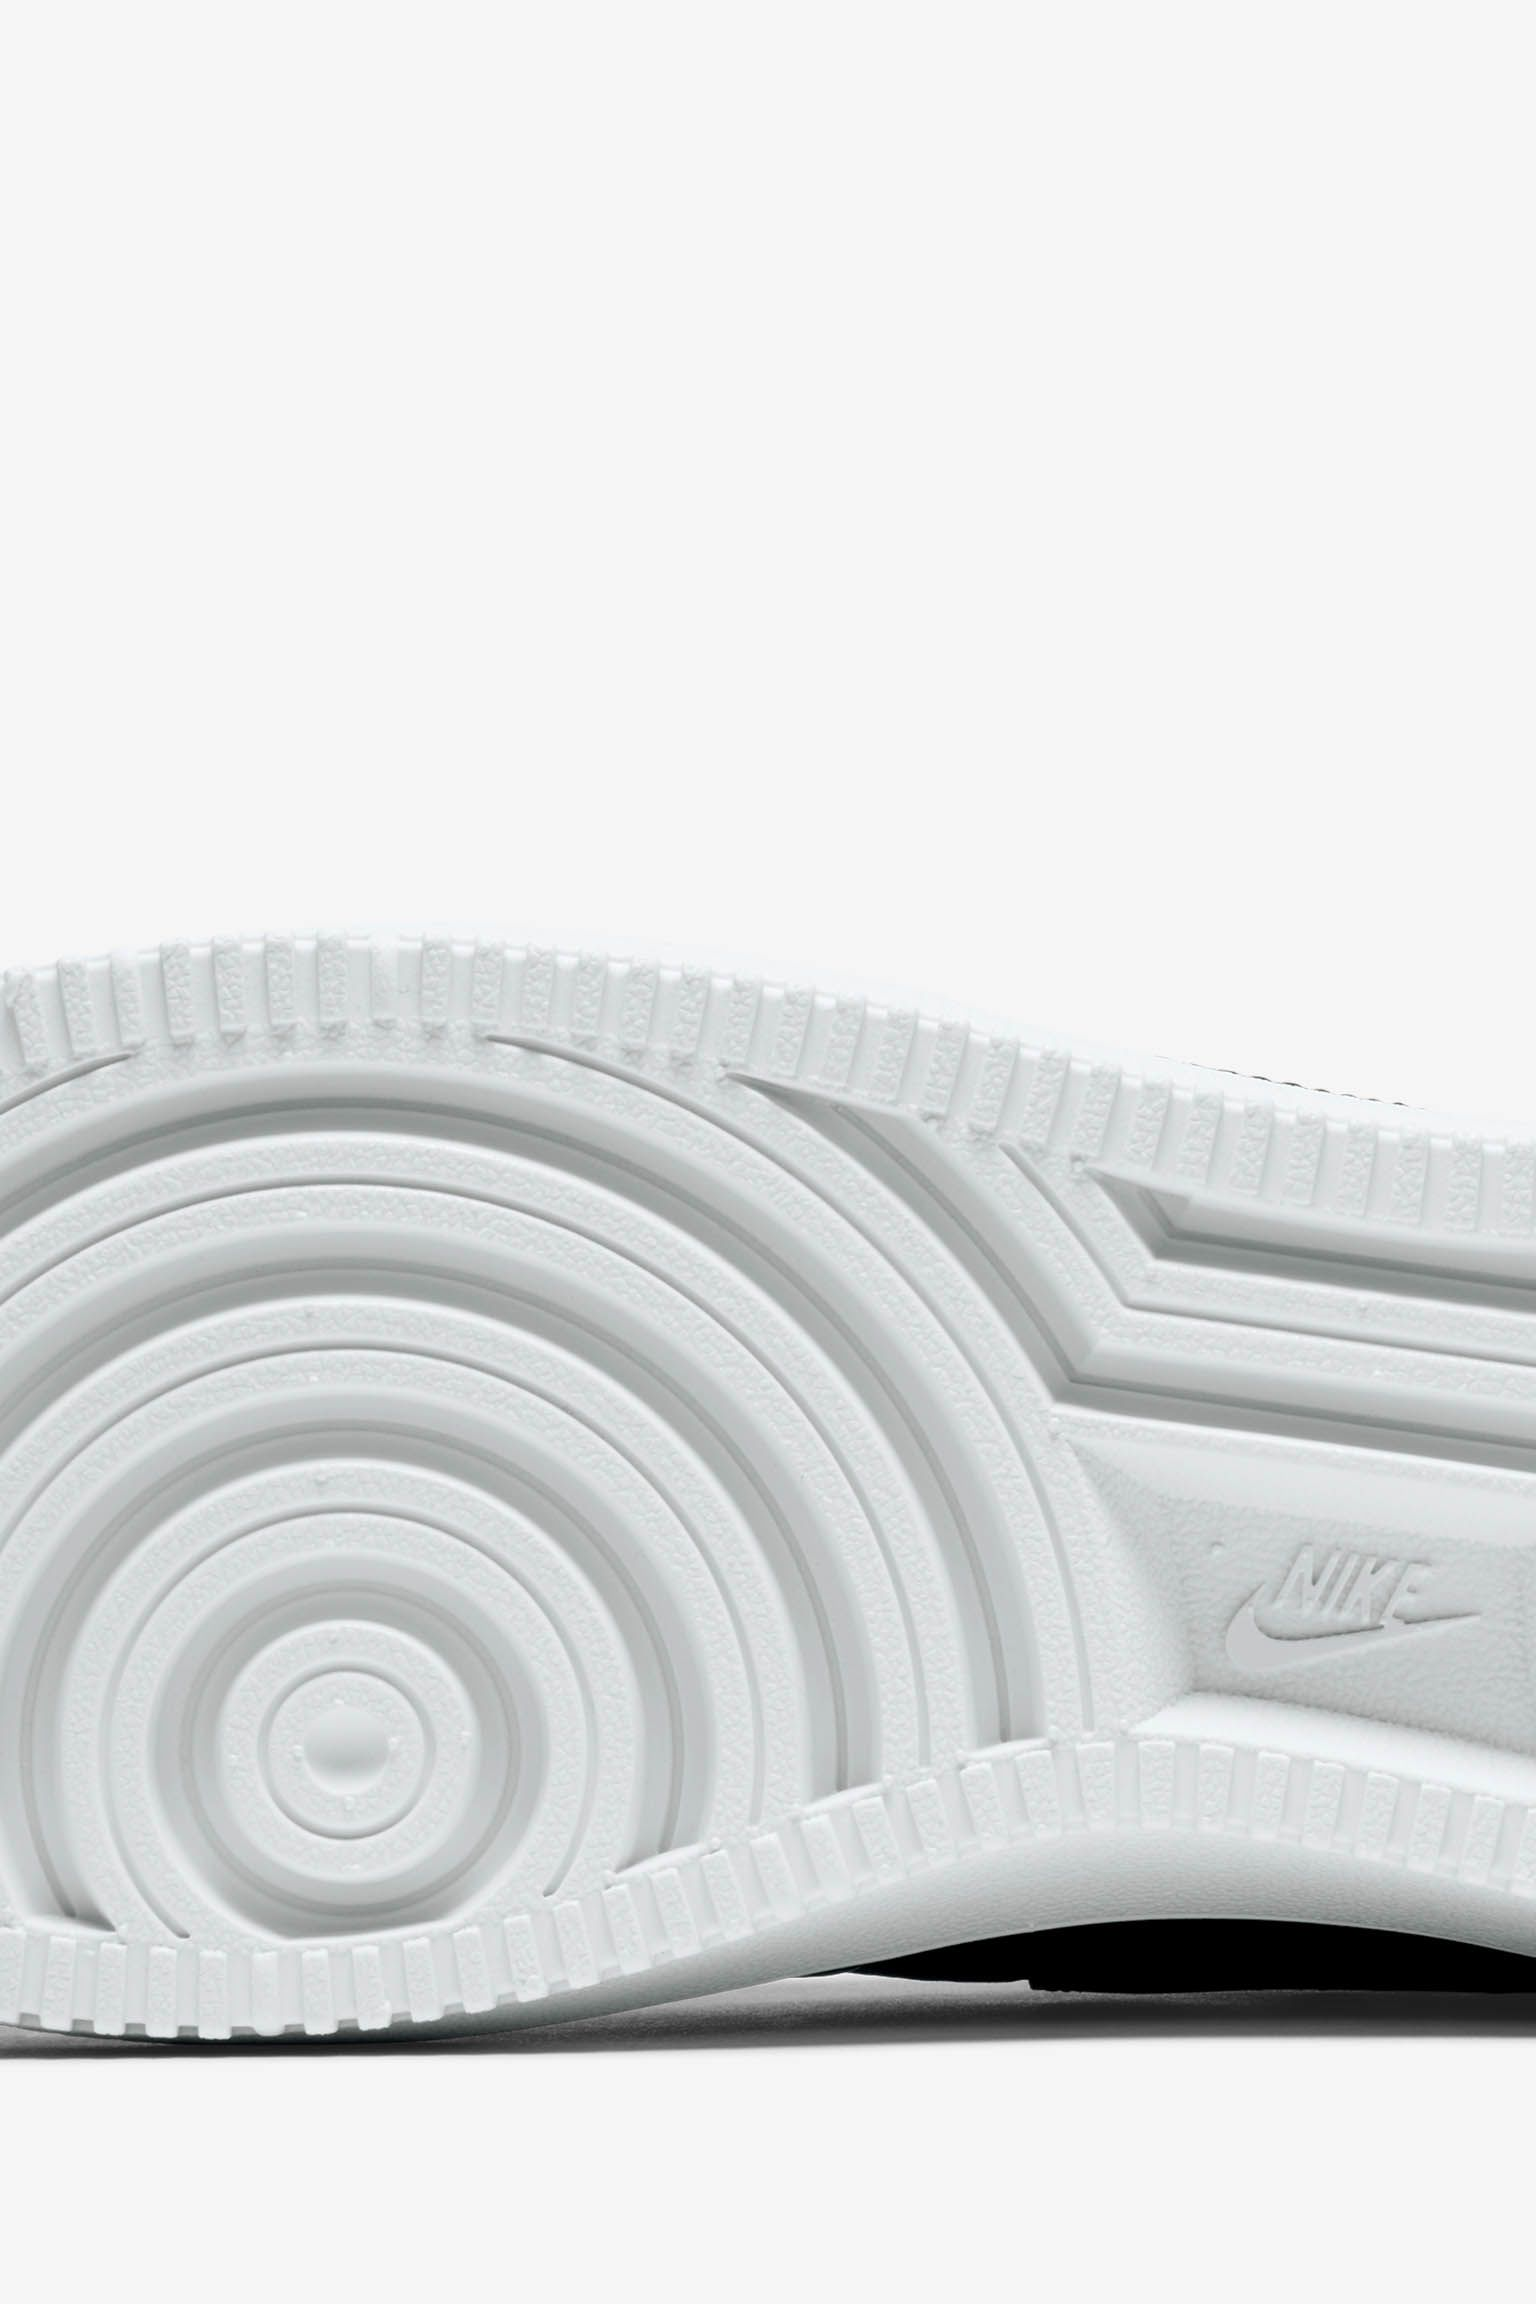 Women's Nike Air Force 1 Ultraforce Mid 'Black & White'